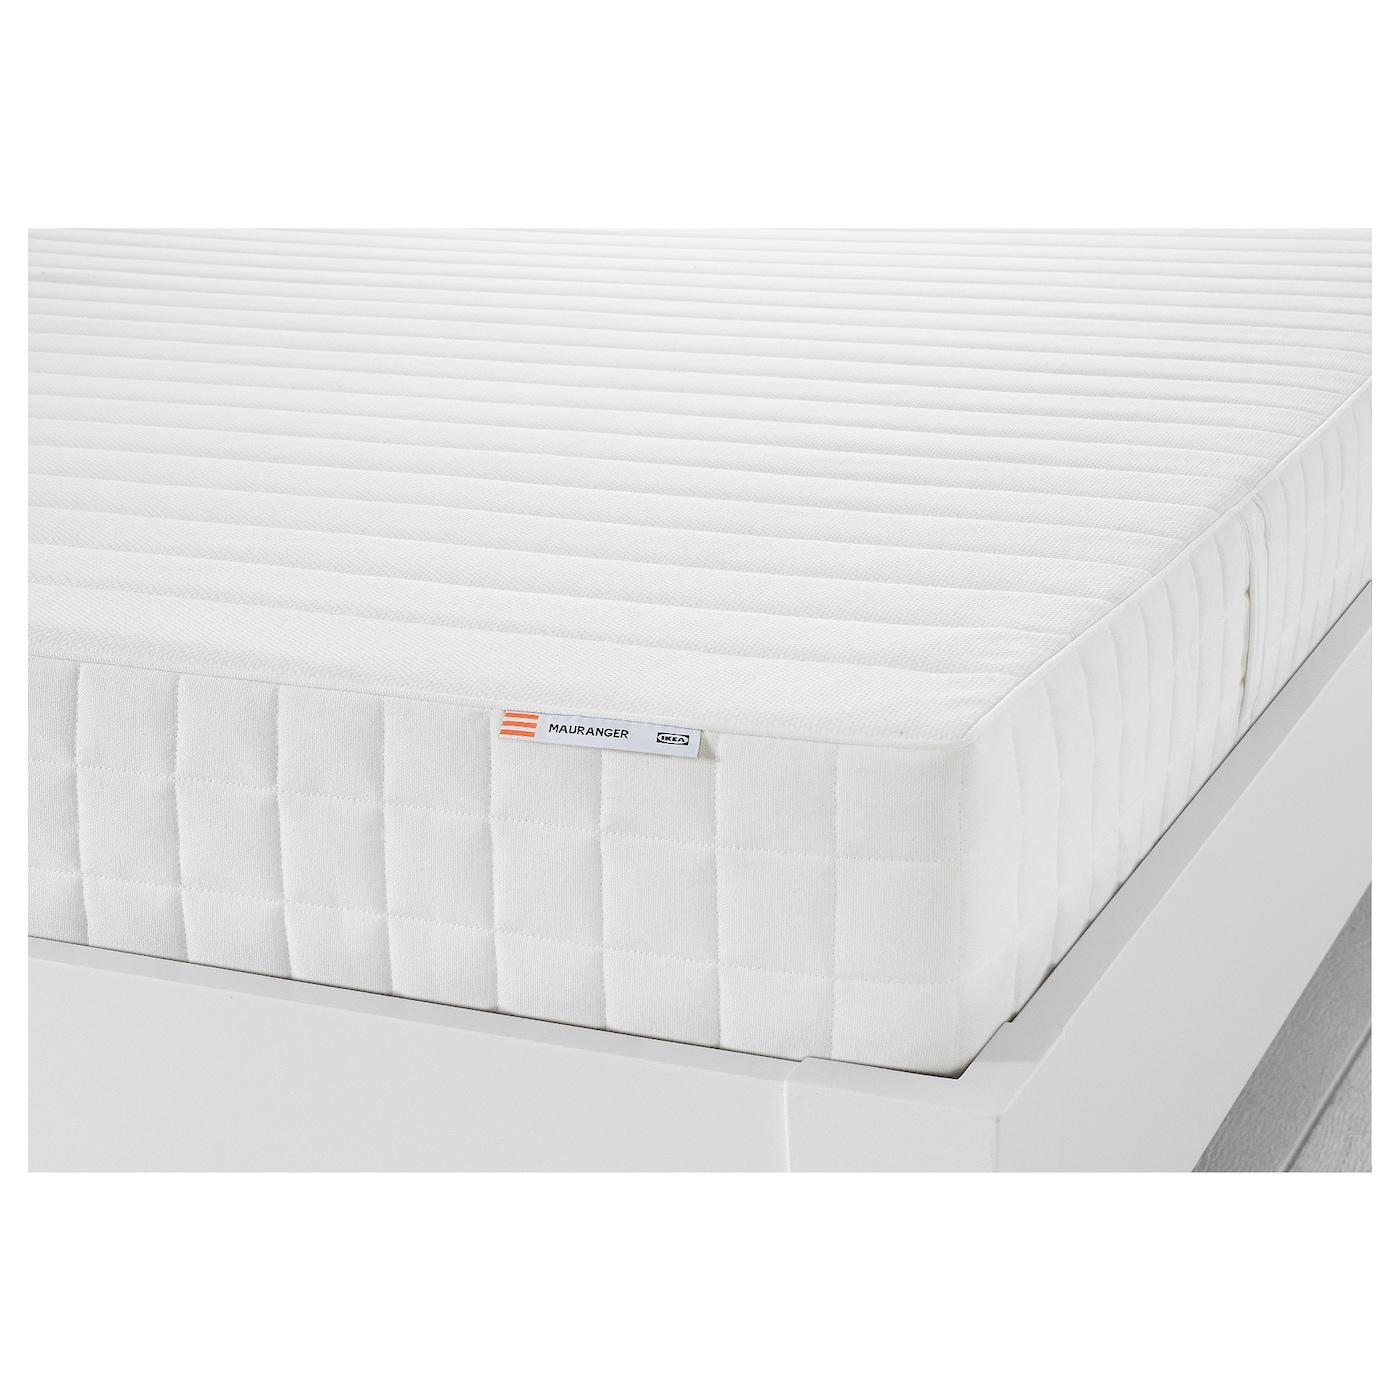 Mauranger Colchon Espuma Firme Blanco 140 X 200 Cm Ikea